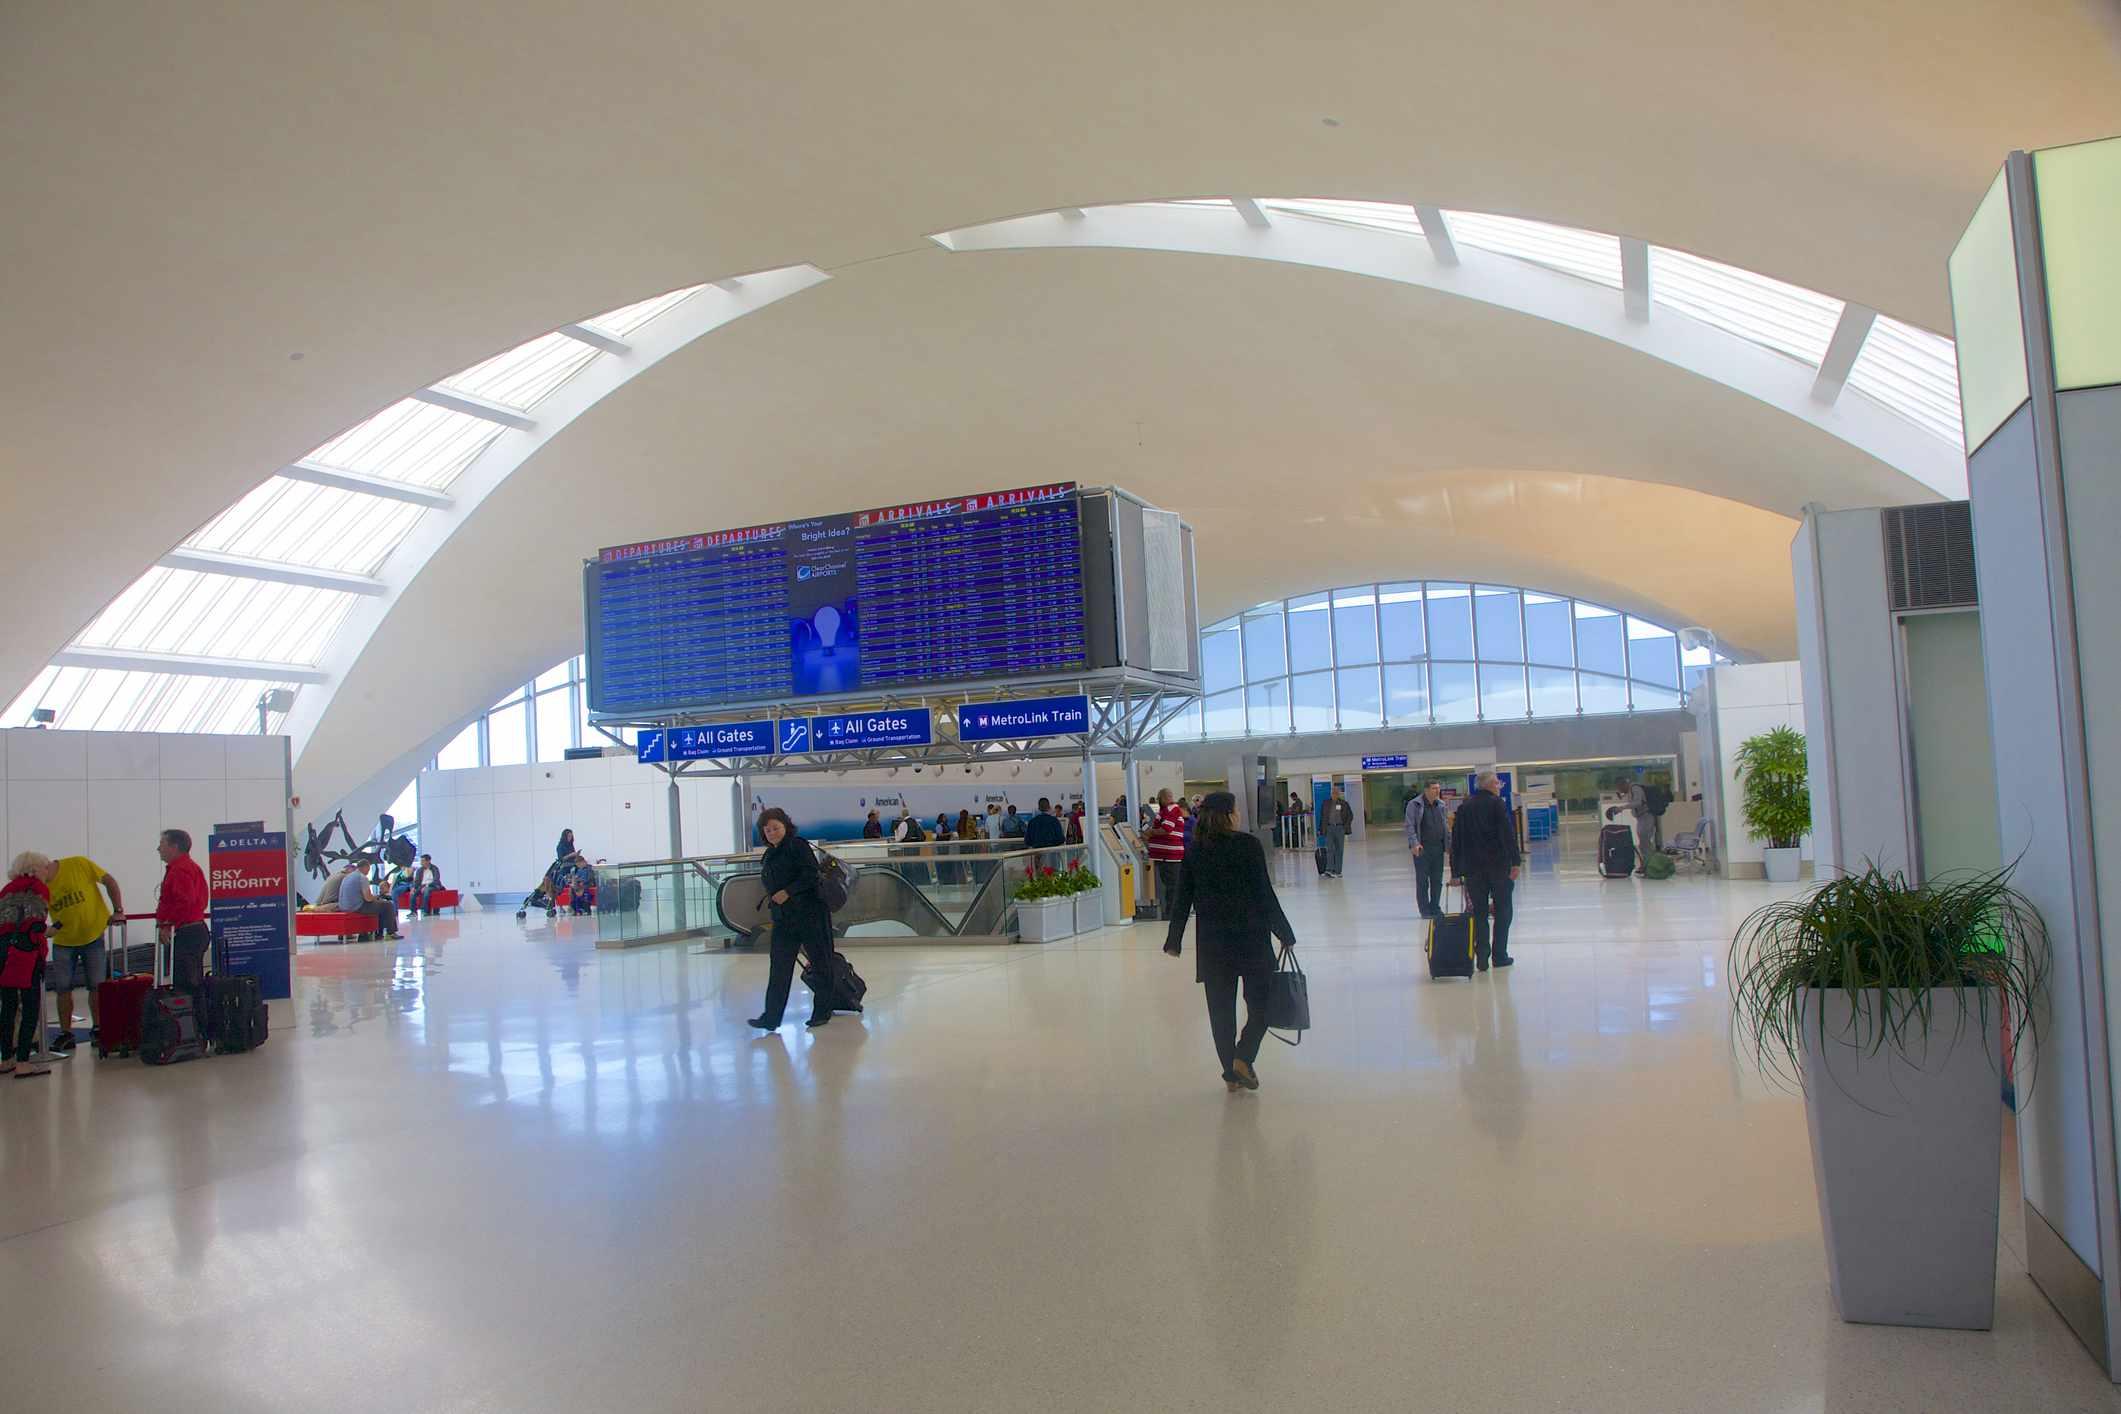 St. Louis Lambert International Airport (STL)